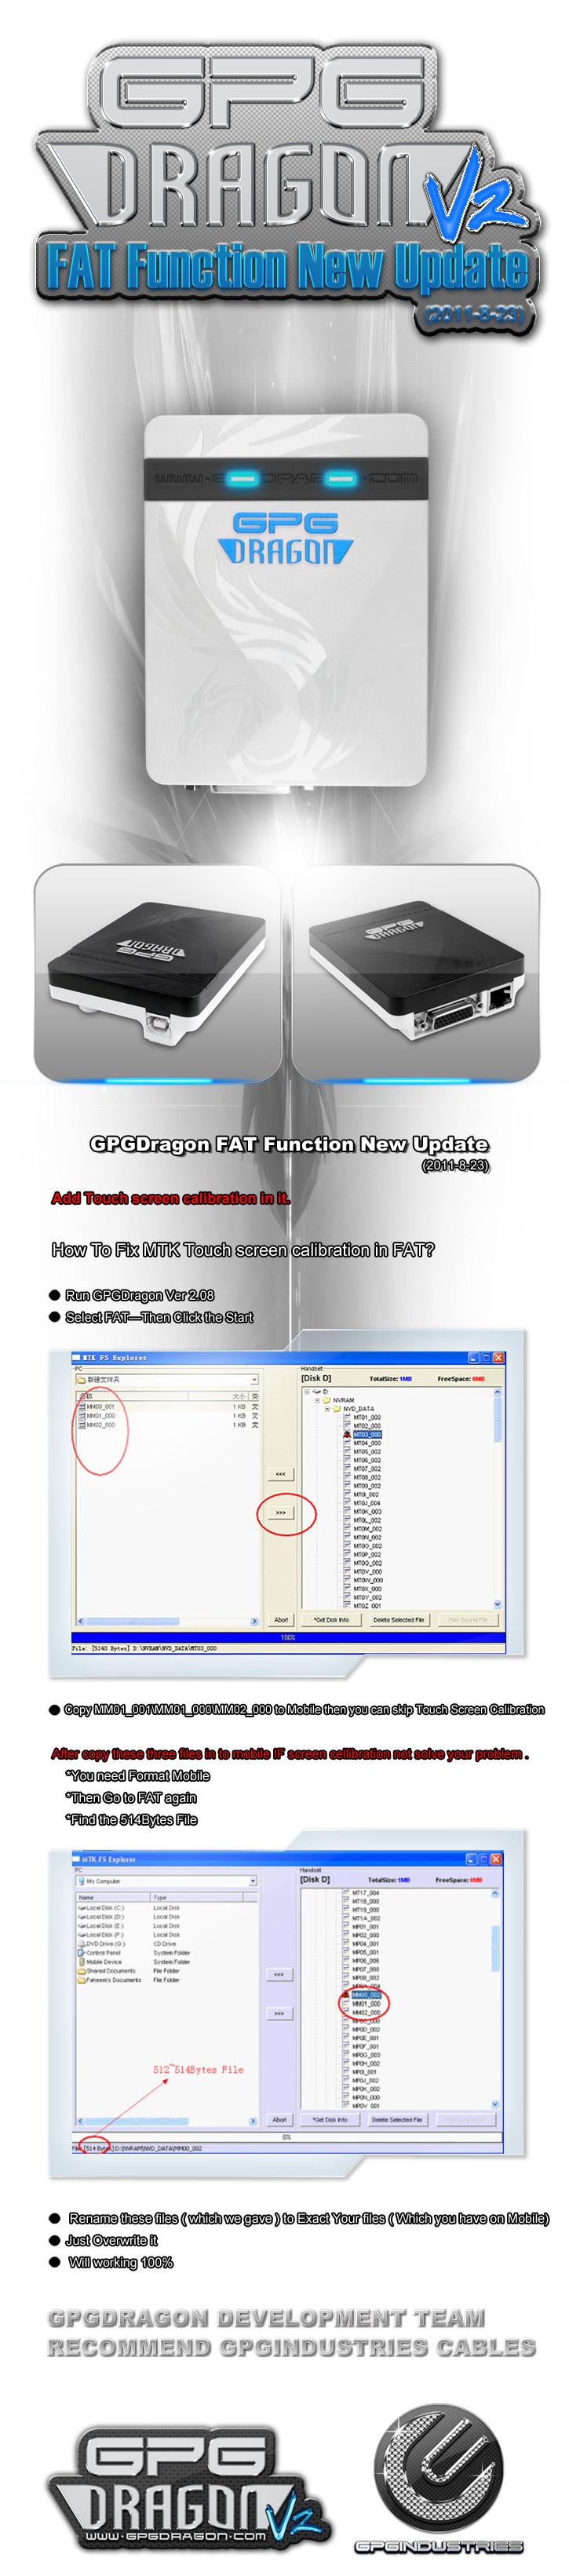 2011 08 23 GPGindustries presents 725